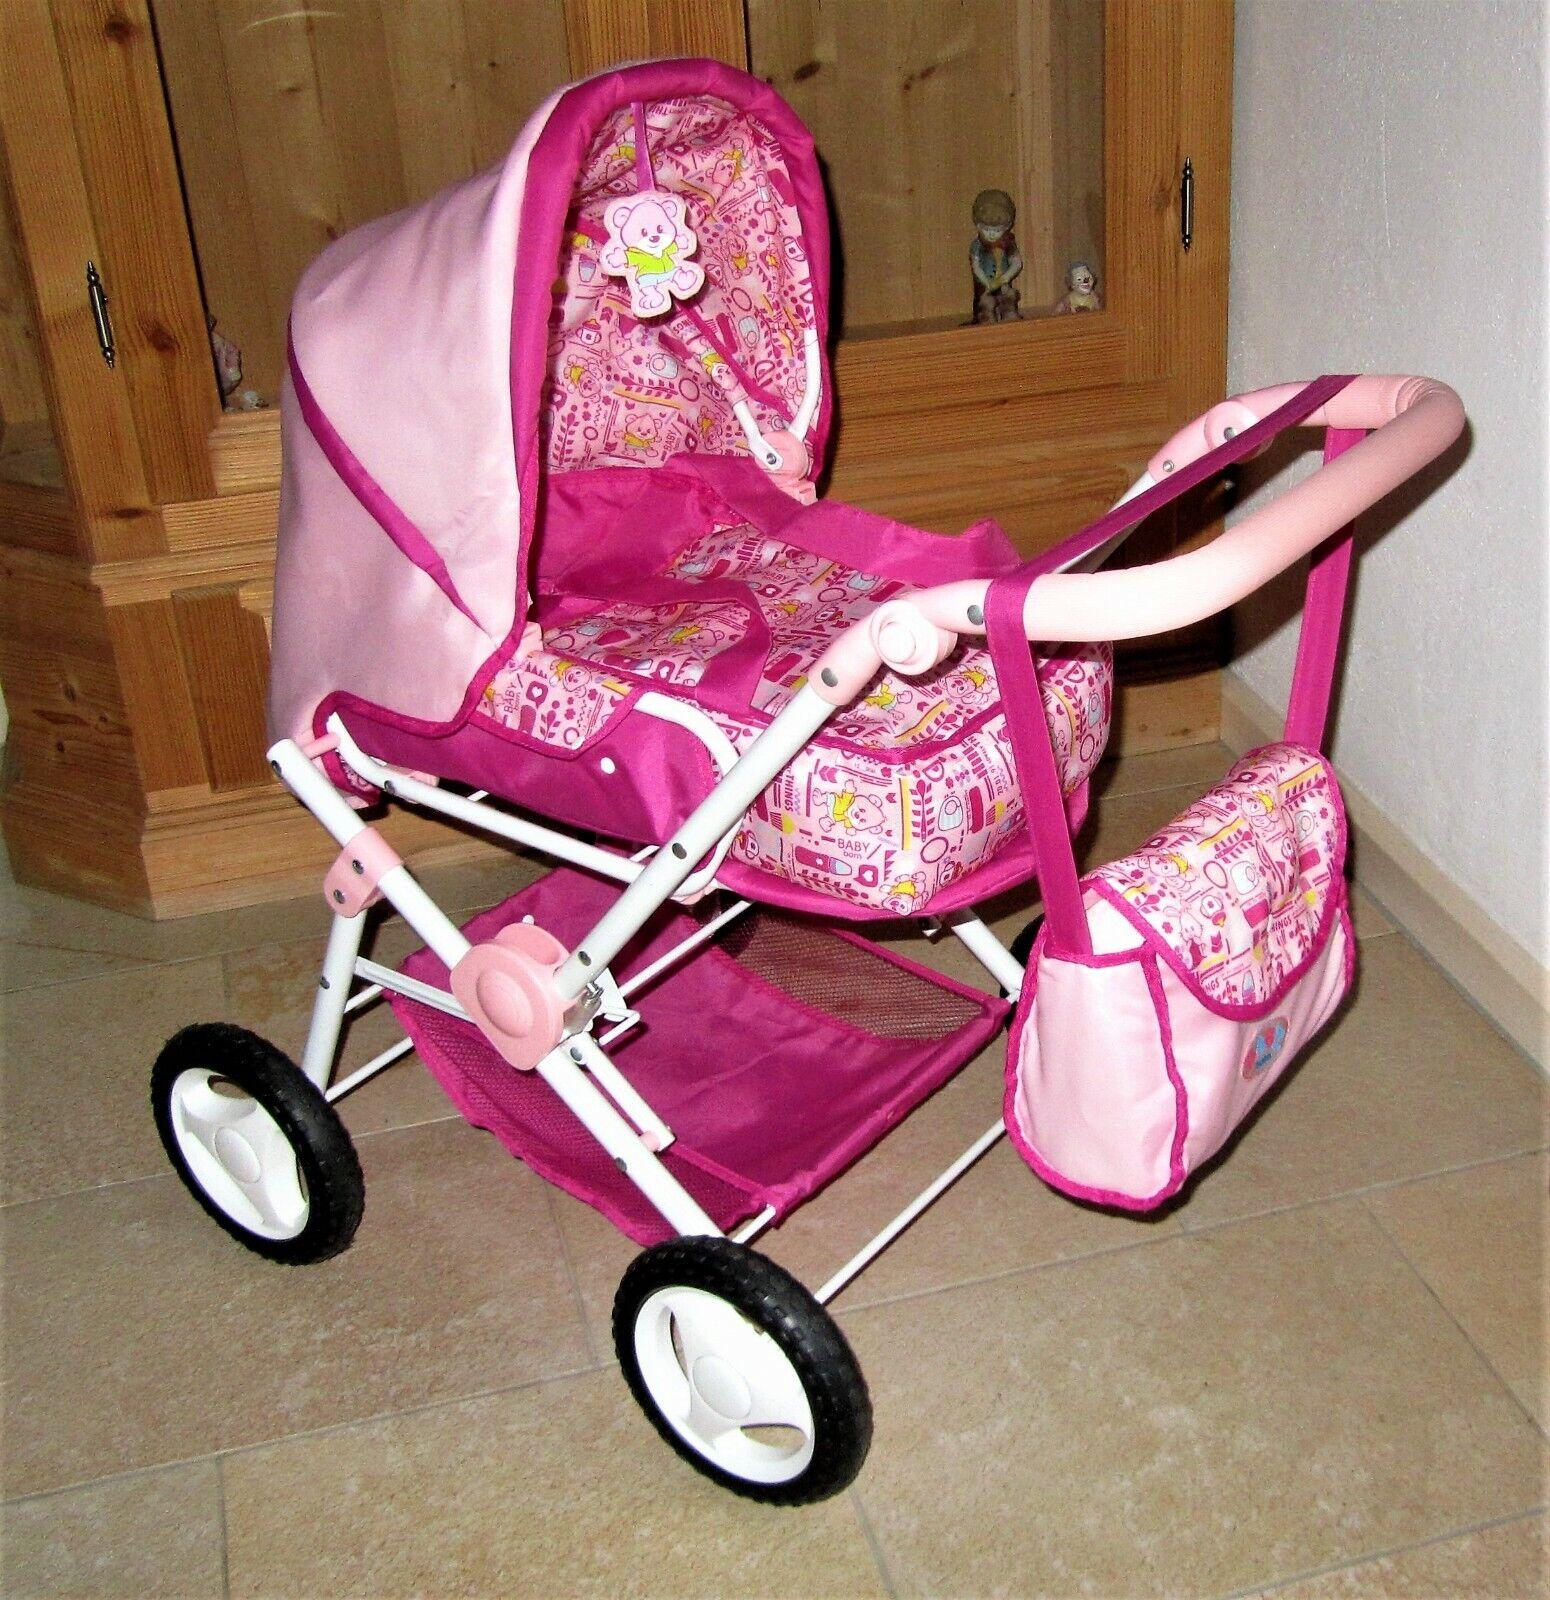 Zapf Creation Baby Born Puppenwagen Kinderwagen inkl. Tasche - TOP